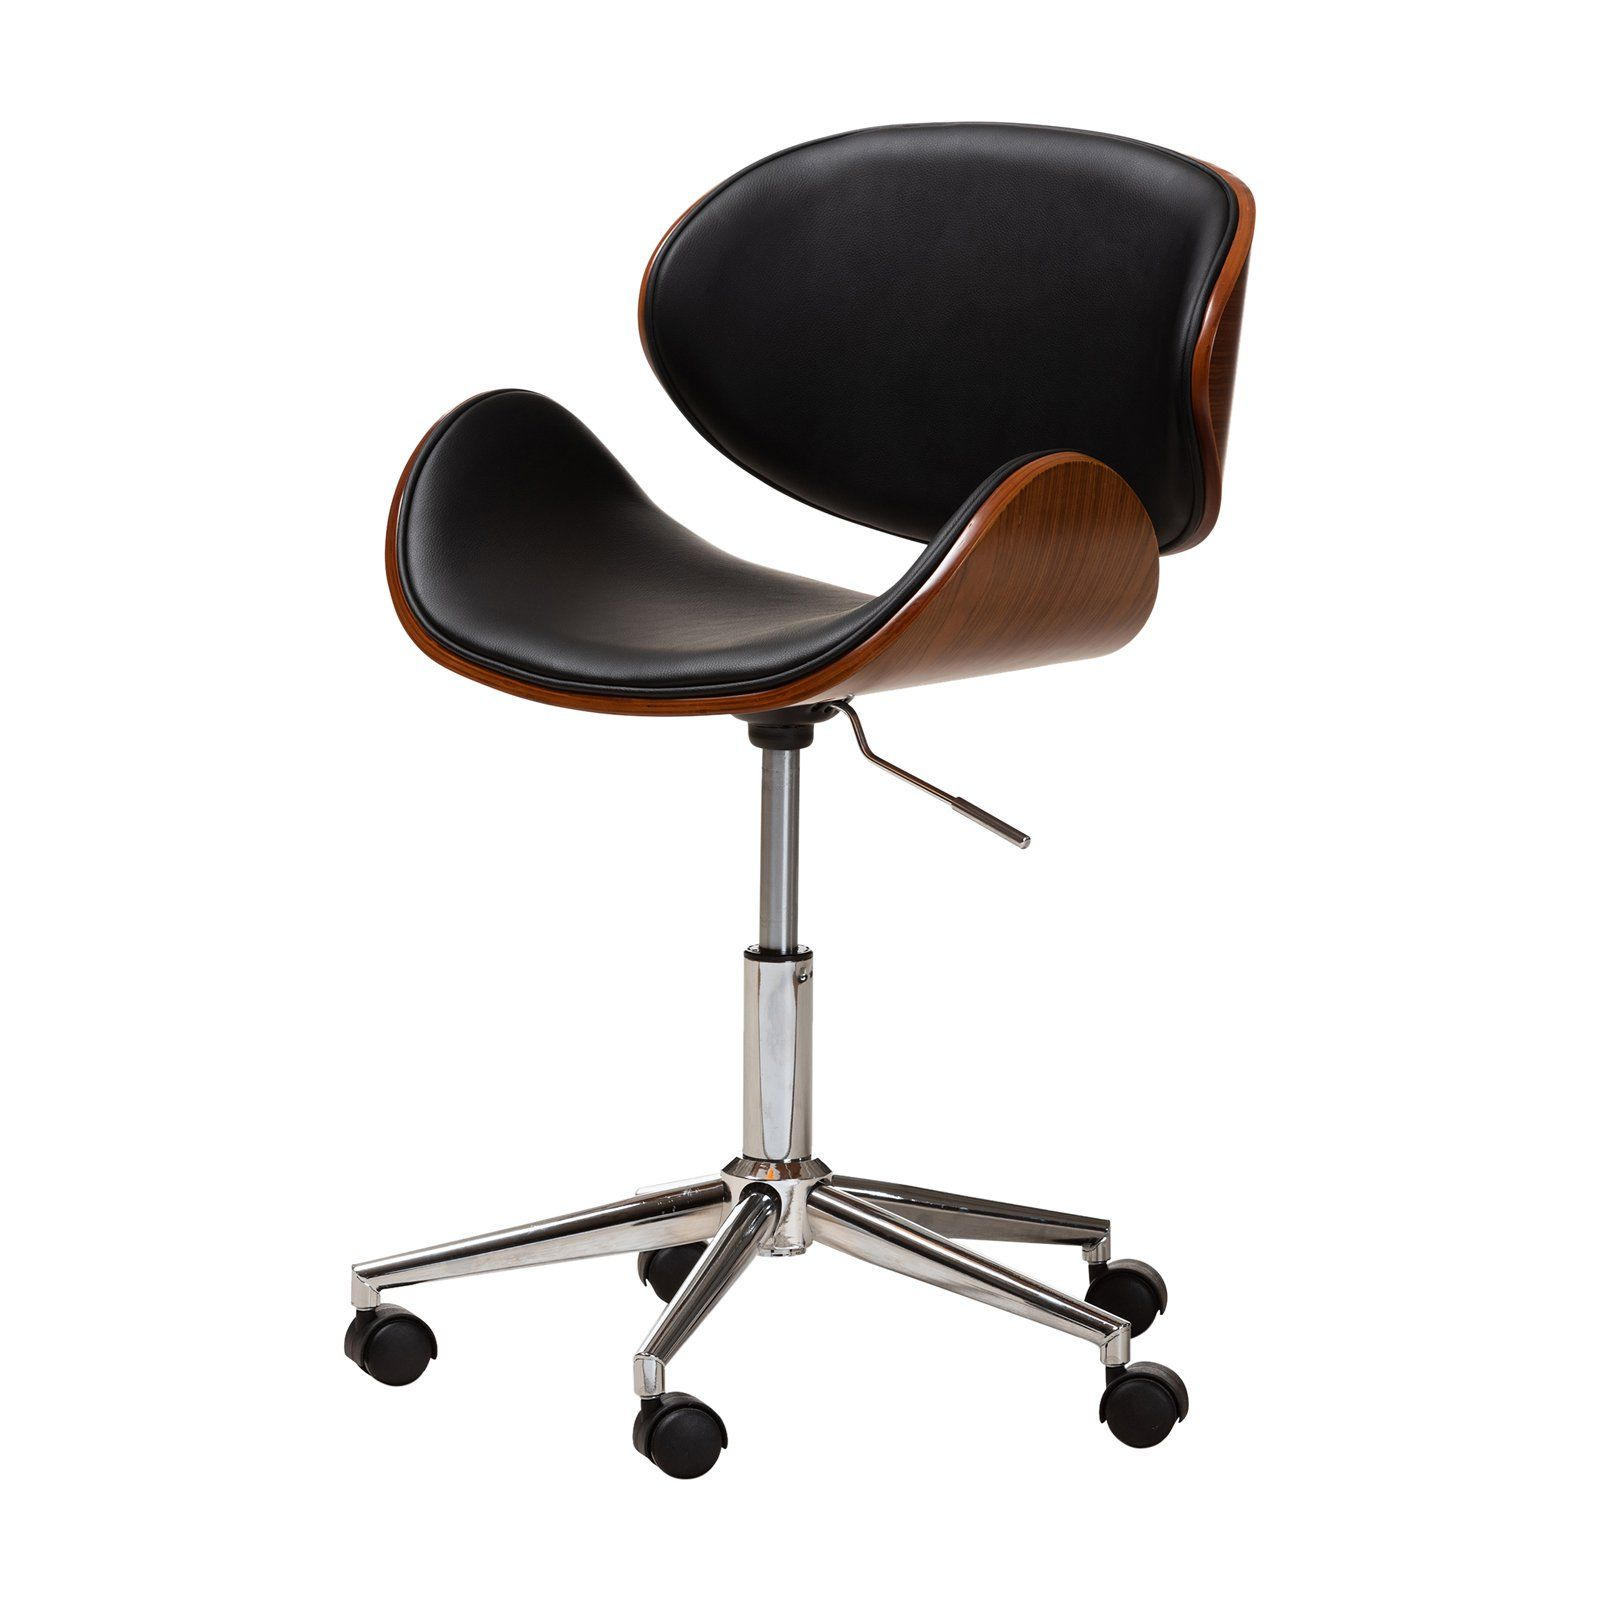 Baxton studio ambrosio modern adjustable office chair